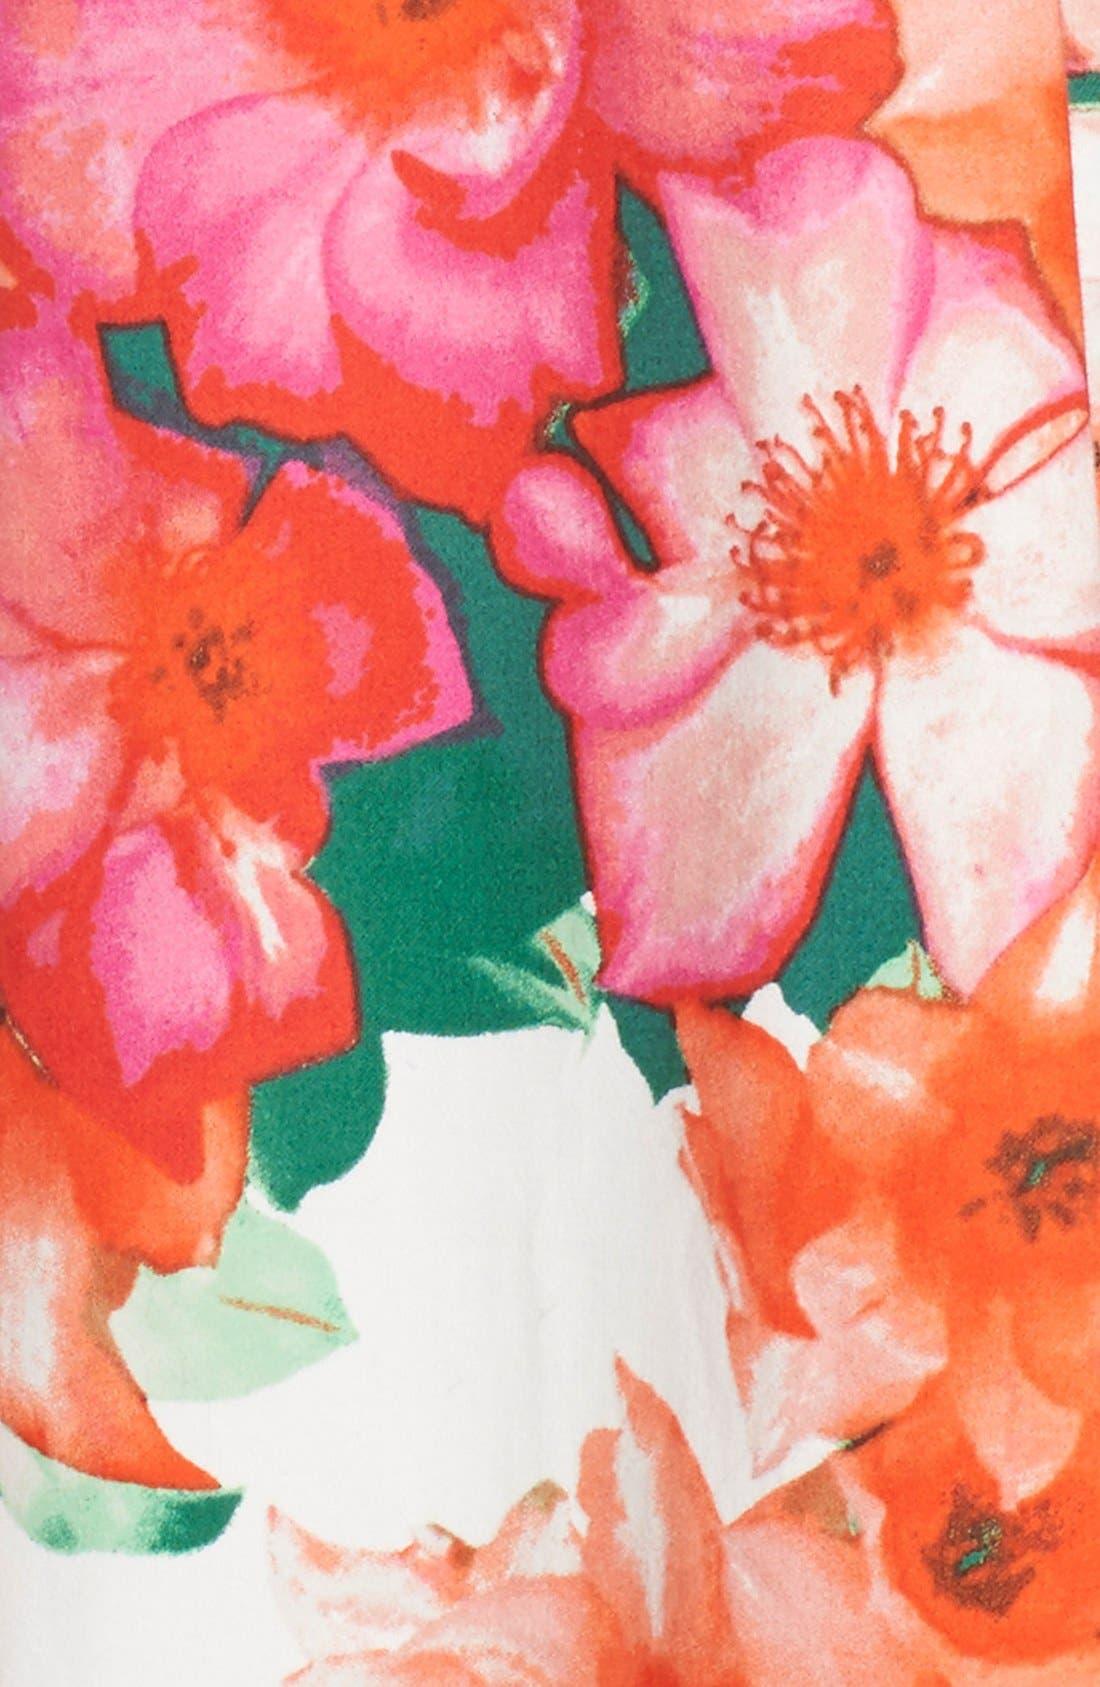 Floral Print Fit & Flare Dress,                             Alternate thumbnail 4, color,                             660